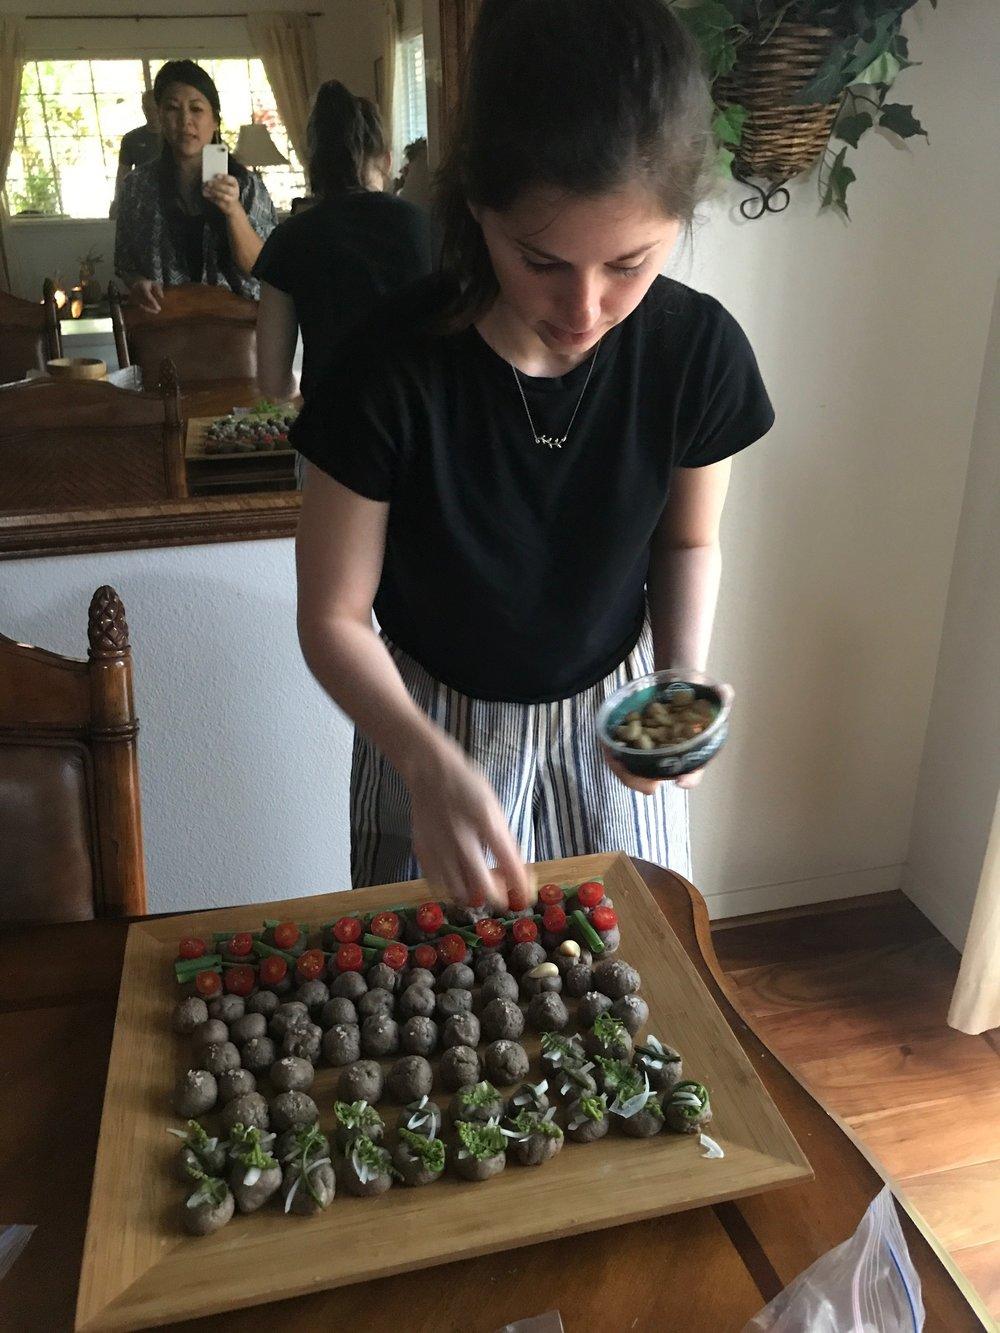 Jessica prepares the meal